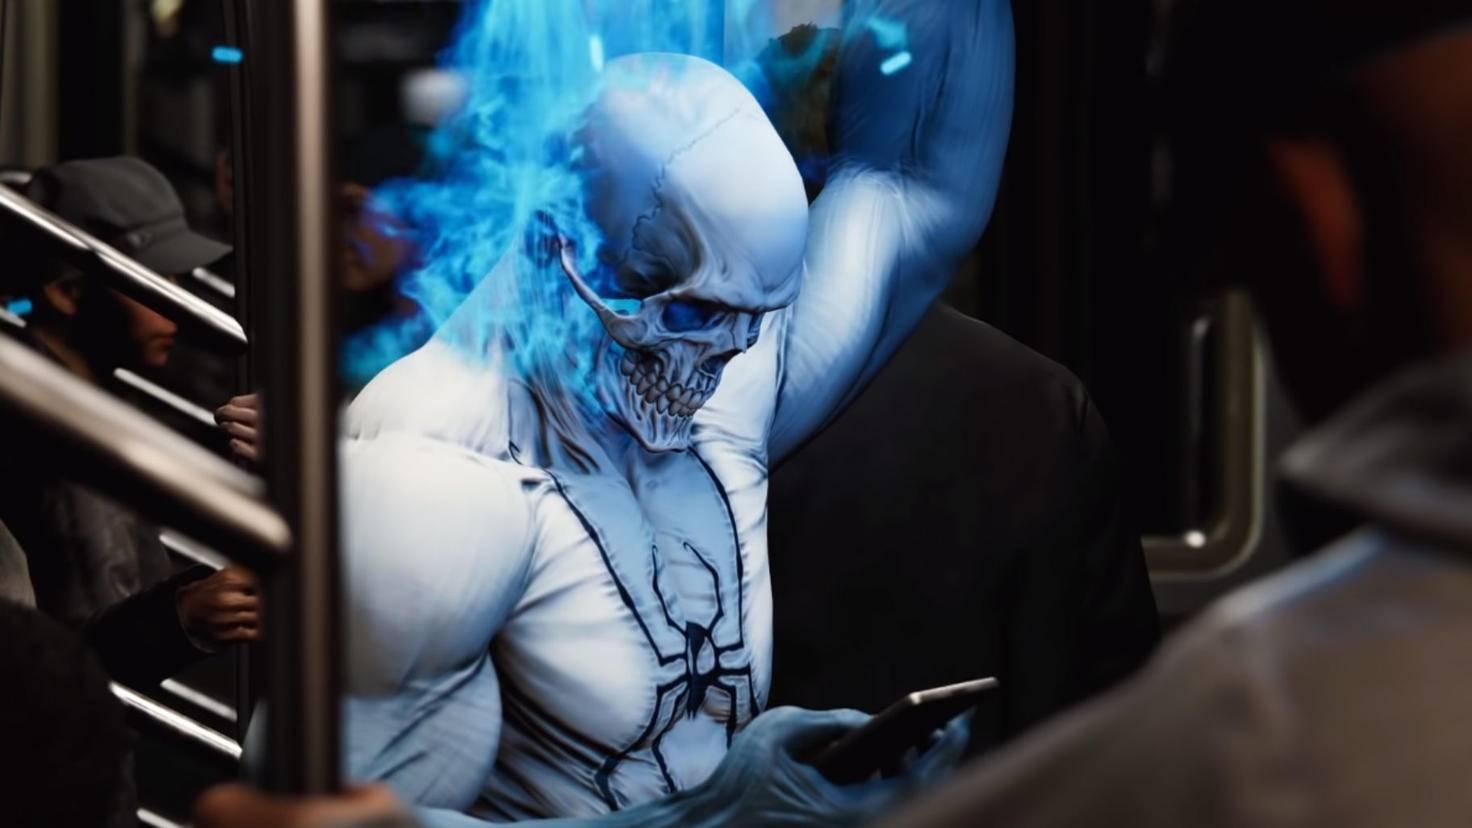 spider-man-ps4-geist-anzug-screenshot